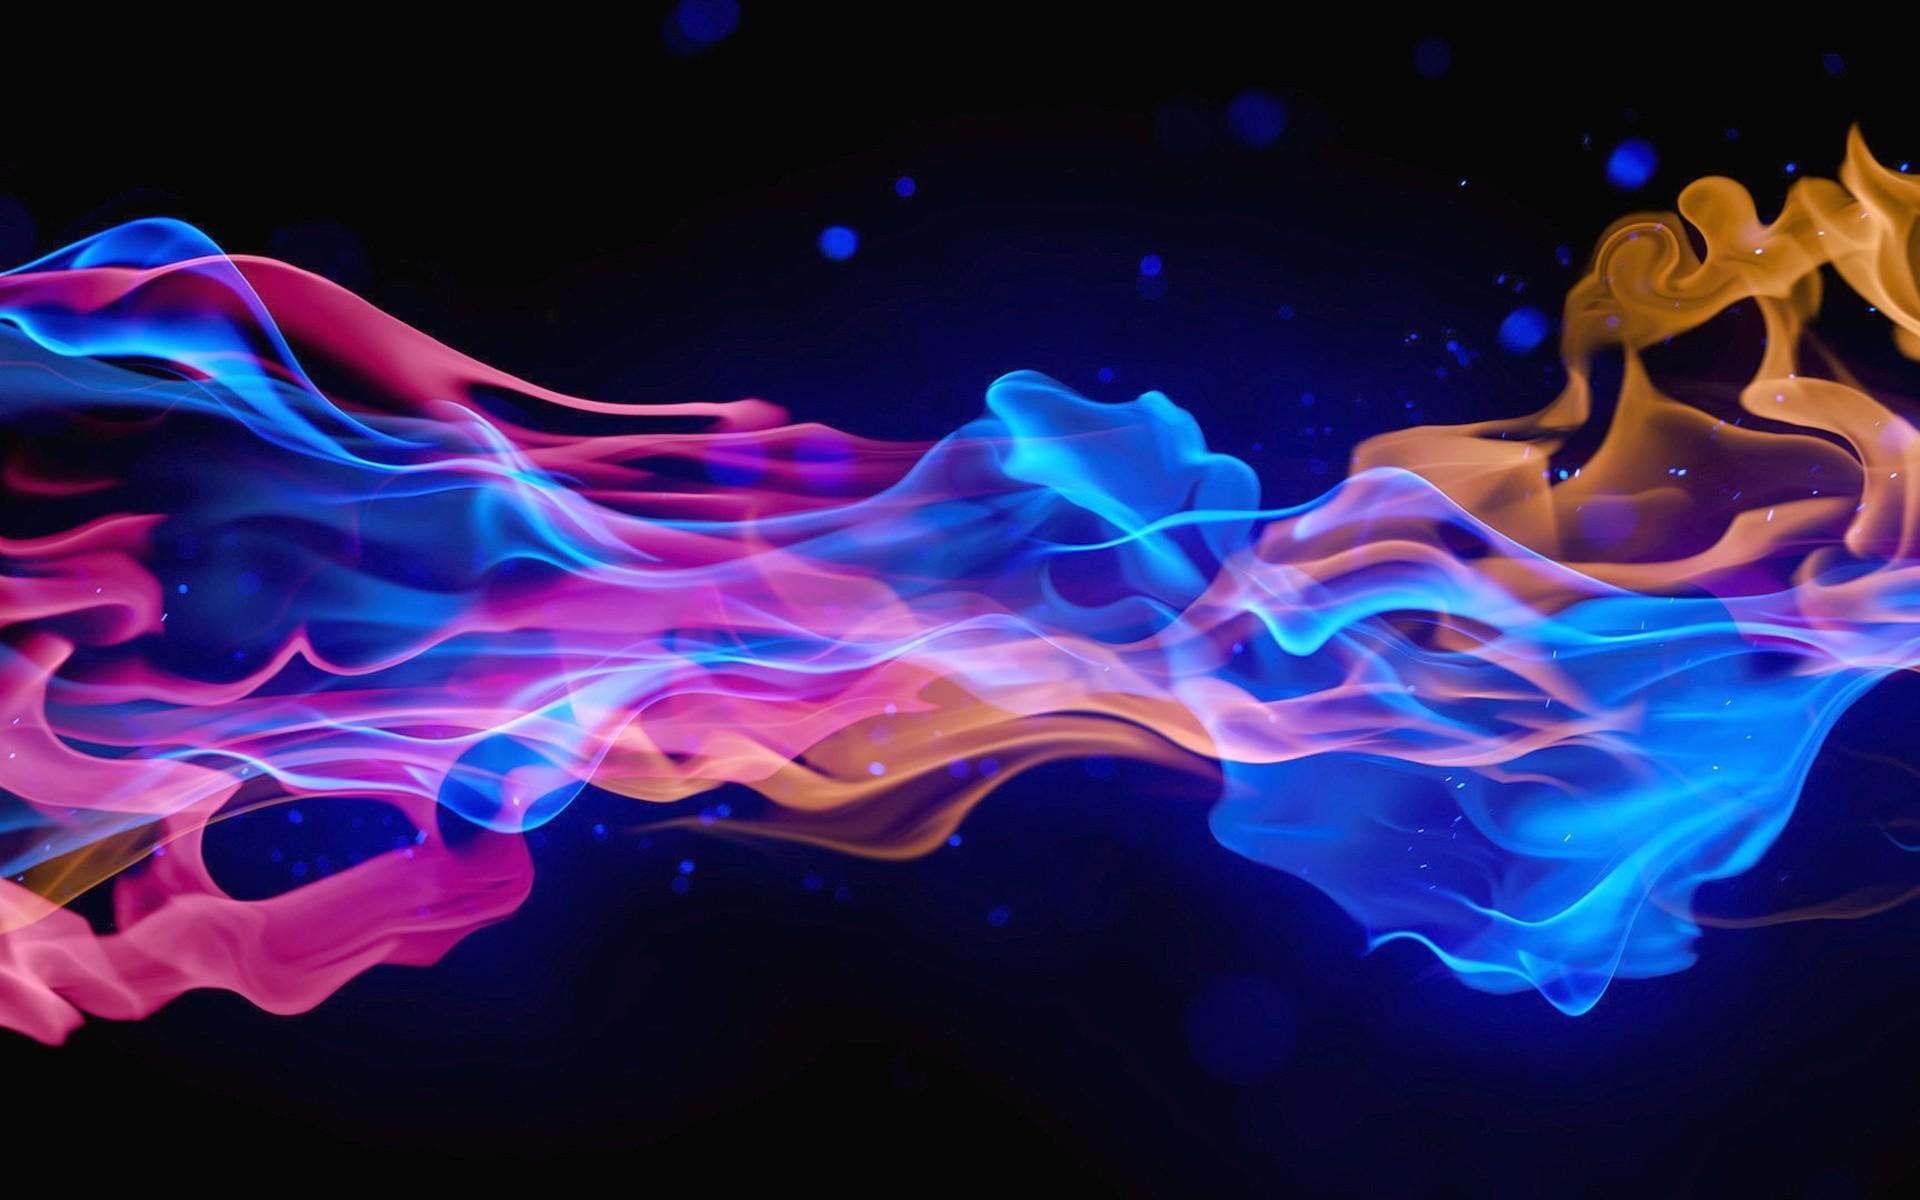 Abstract – Smoke Wallpaper | Wallpapers | Pinterest | Smoke wallpaper,  Artistic wallpaper and Wallpaper